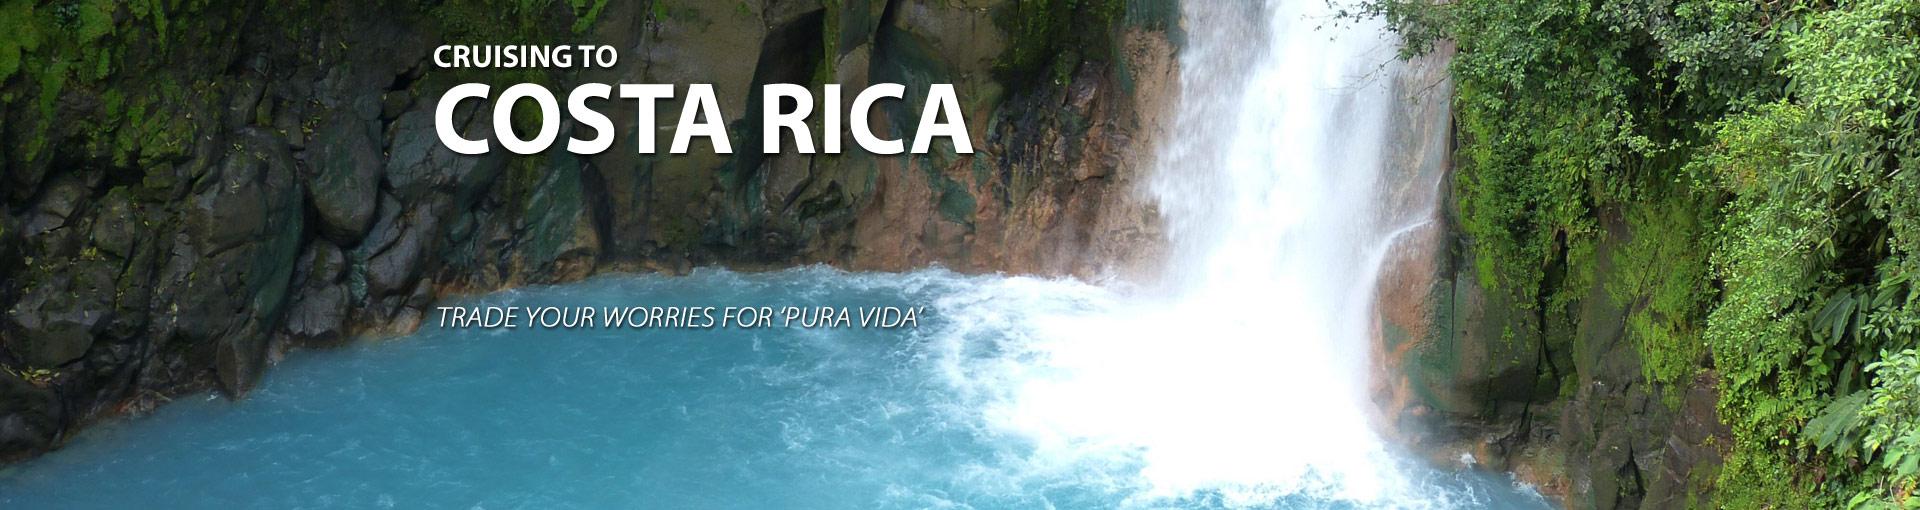 Cruises to Costa Rica